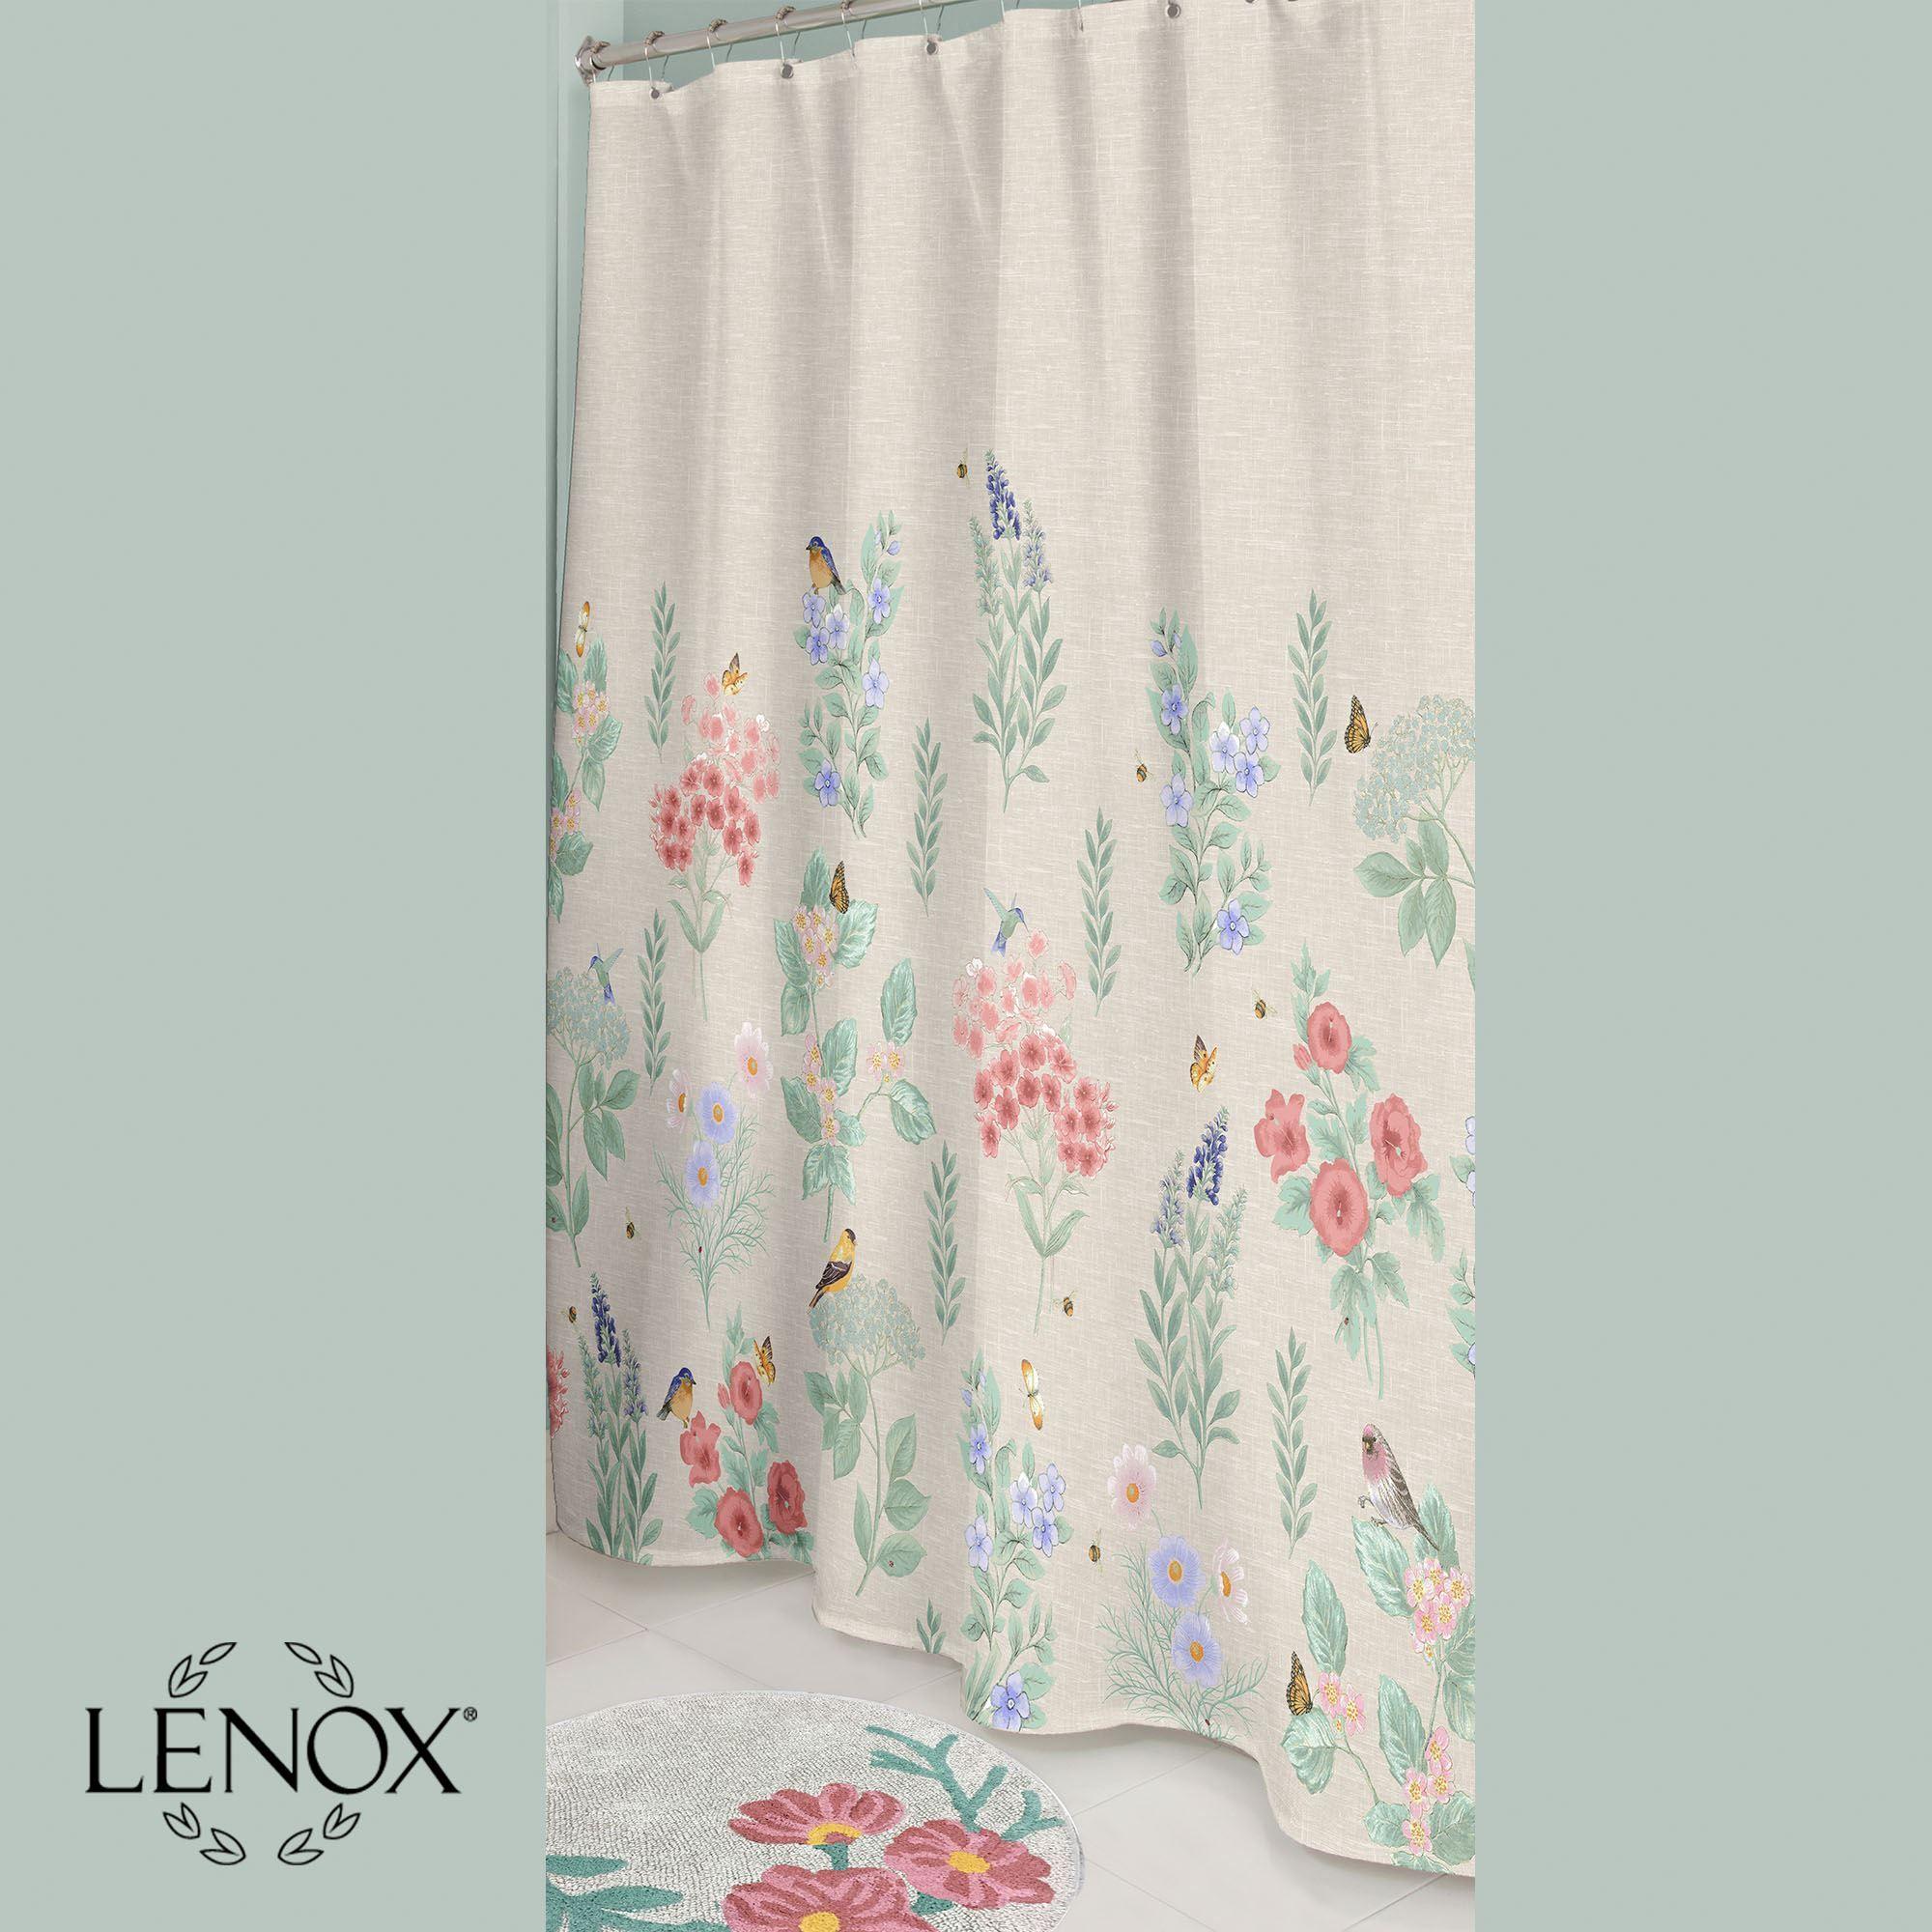 Lenox Meadow Birds Floral Shower Curtain